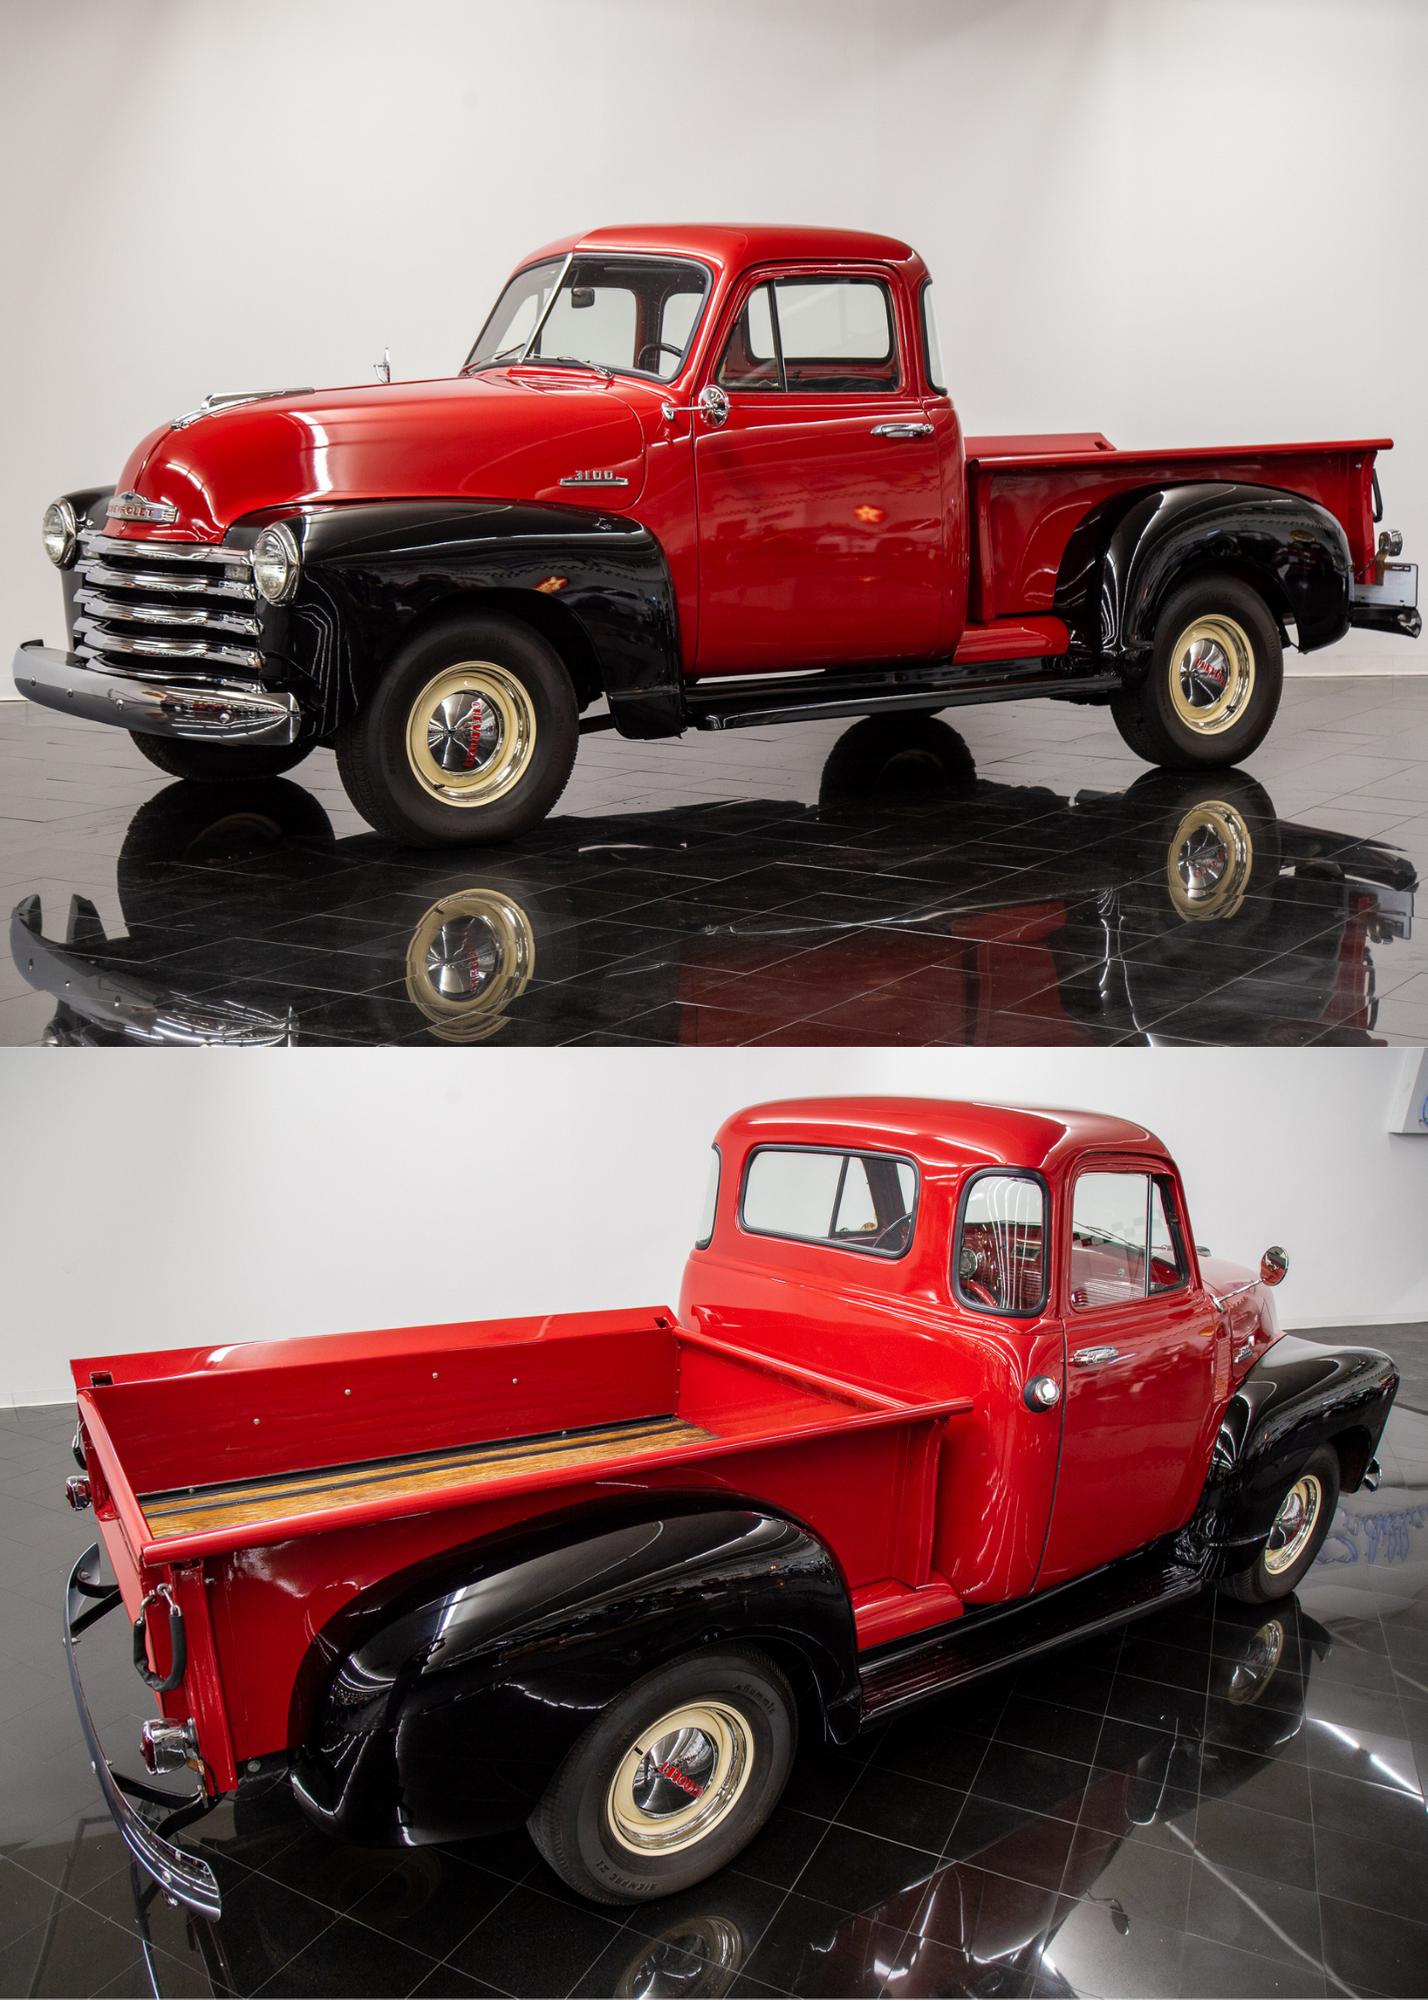 Sold 1953 Chevrolet 3100 5-Window Pickup Truck